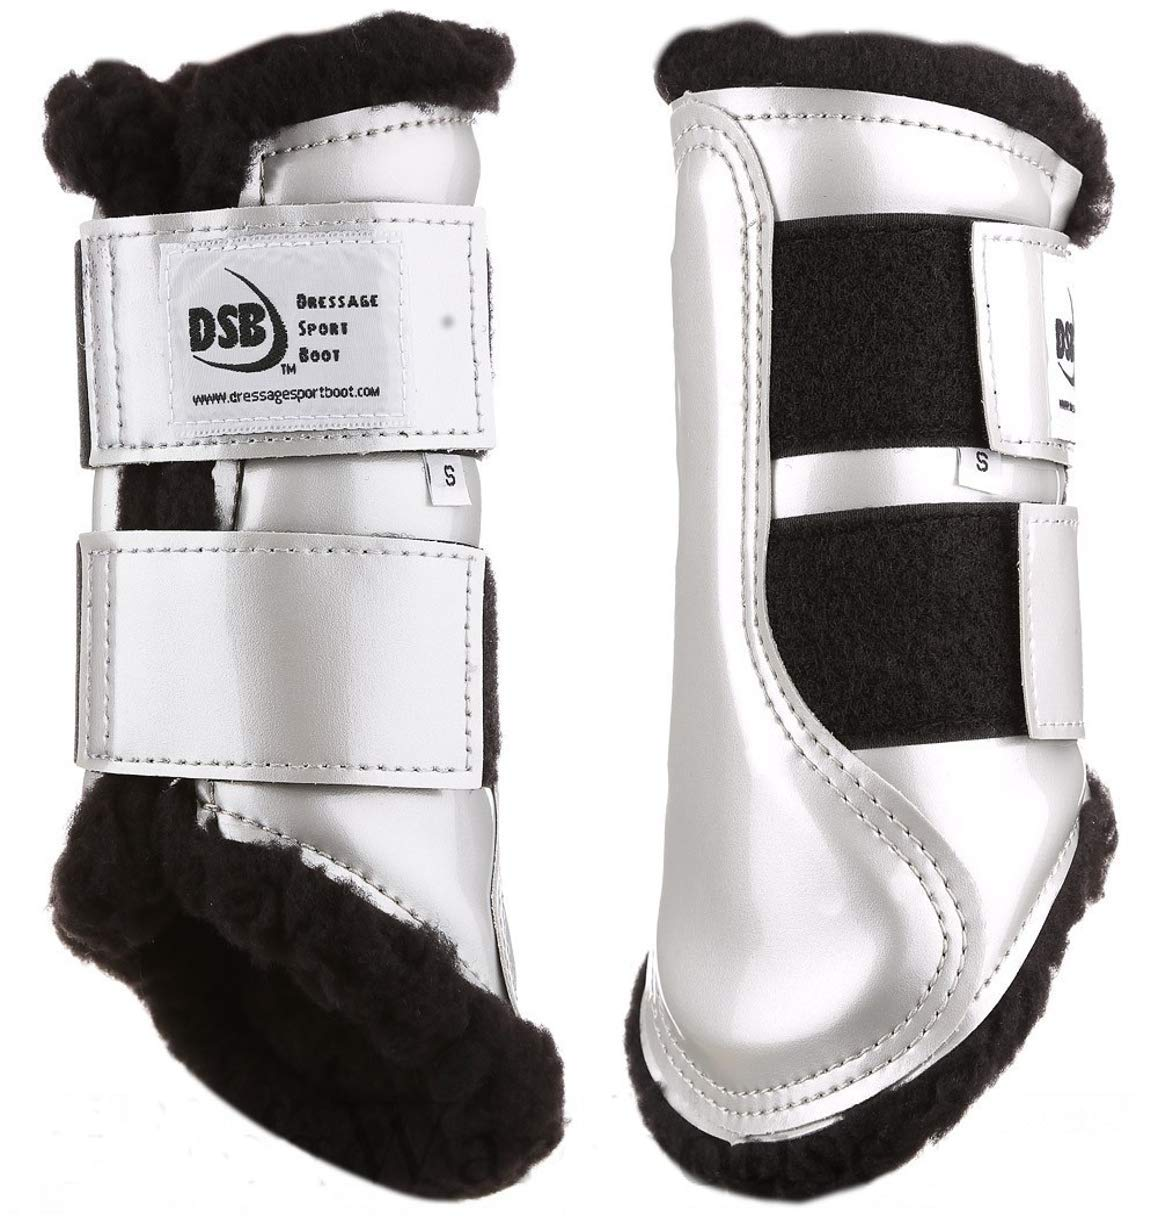 Dressage スポーツブーツ (DSB, 複数の色とサイズ L マルチカラー 0004674322994 B07FQYKNV9 L|Patent Silver/Black Fleece Patent Silver/Black Fleece L